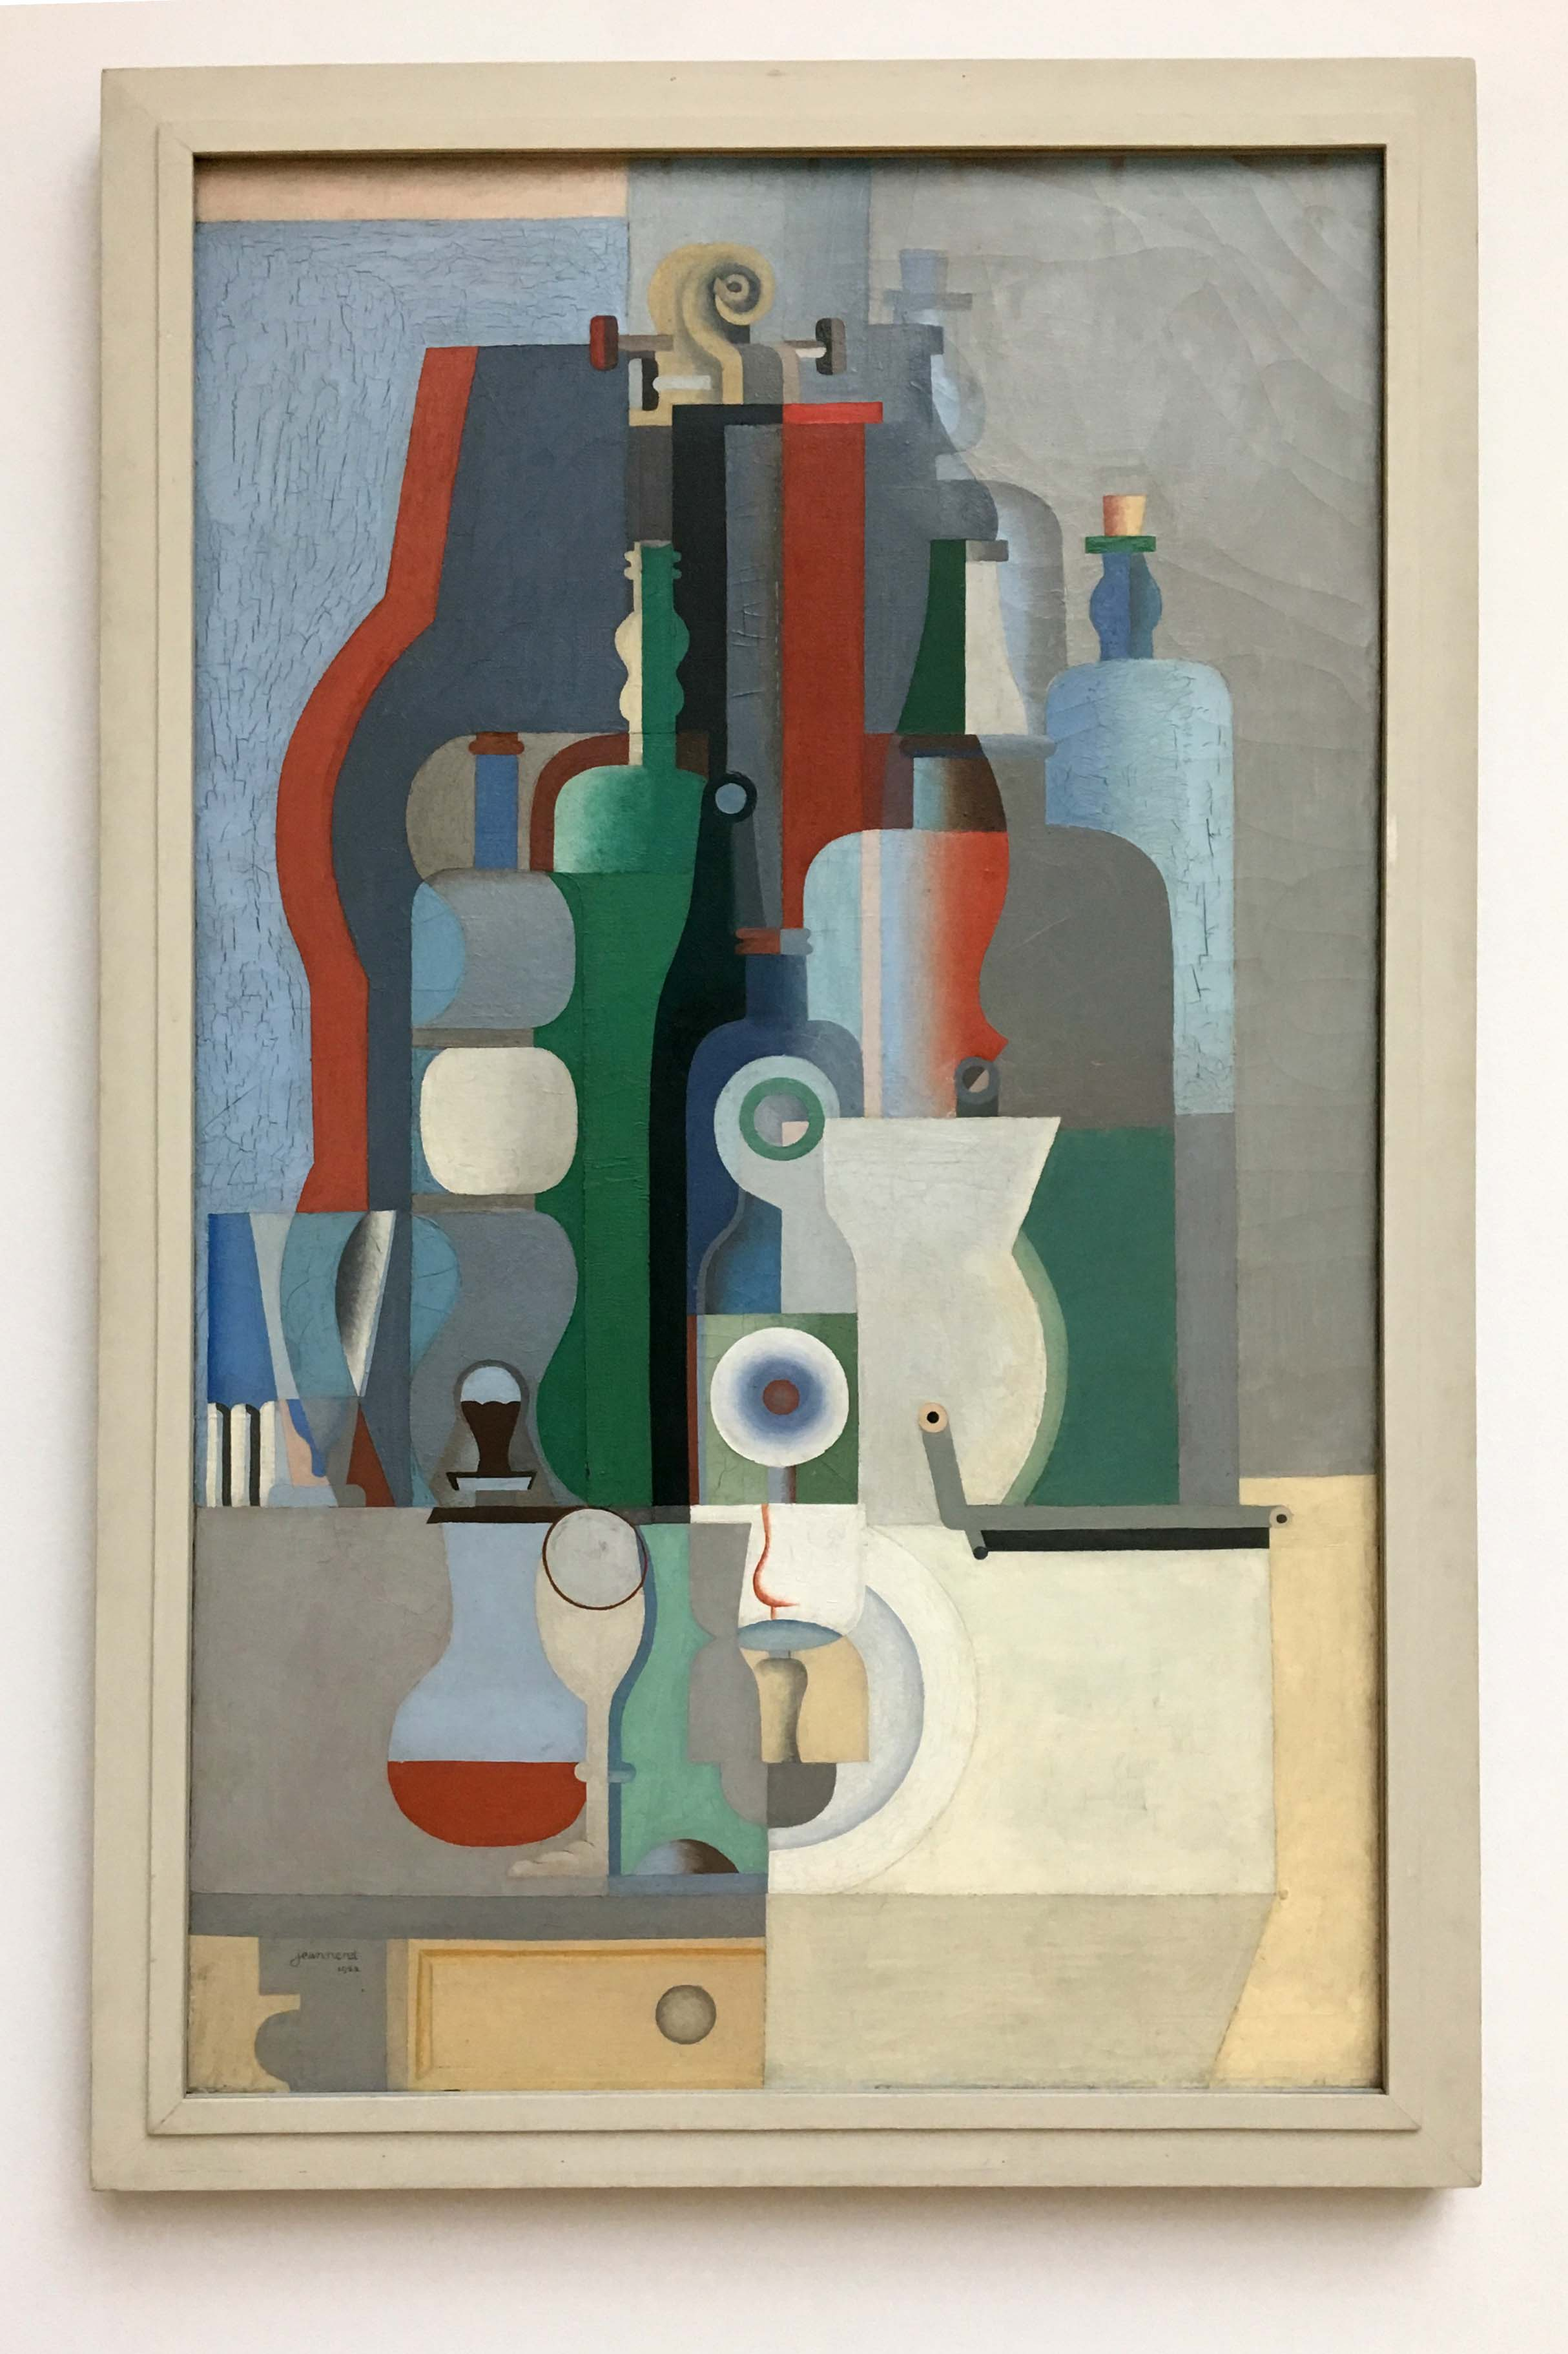 Le Corbusier, Vertical Still Life, 1922